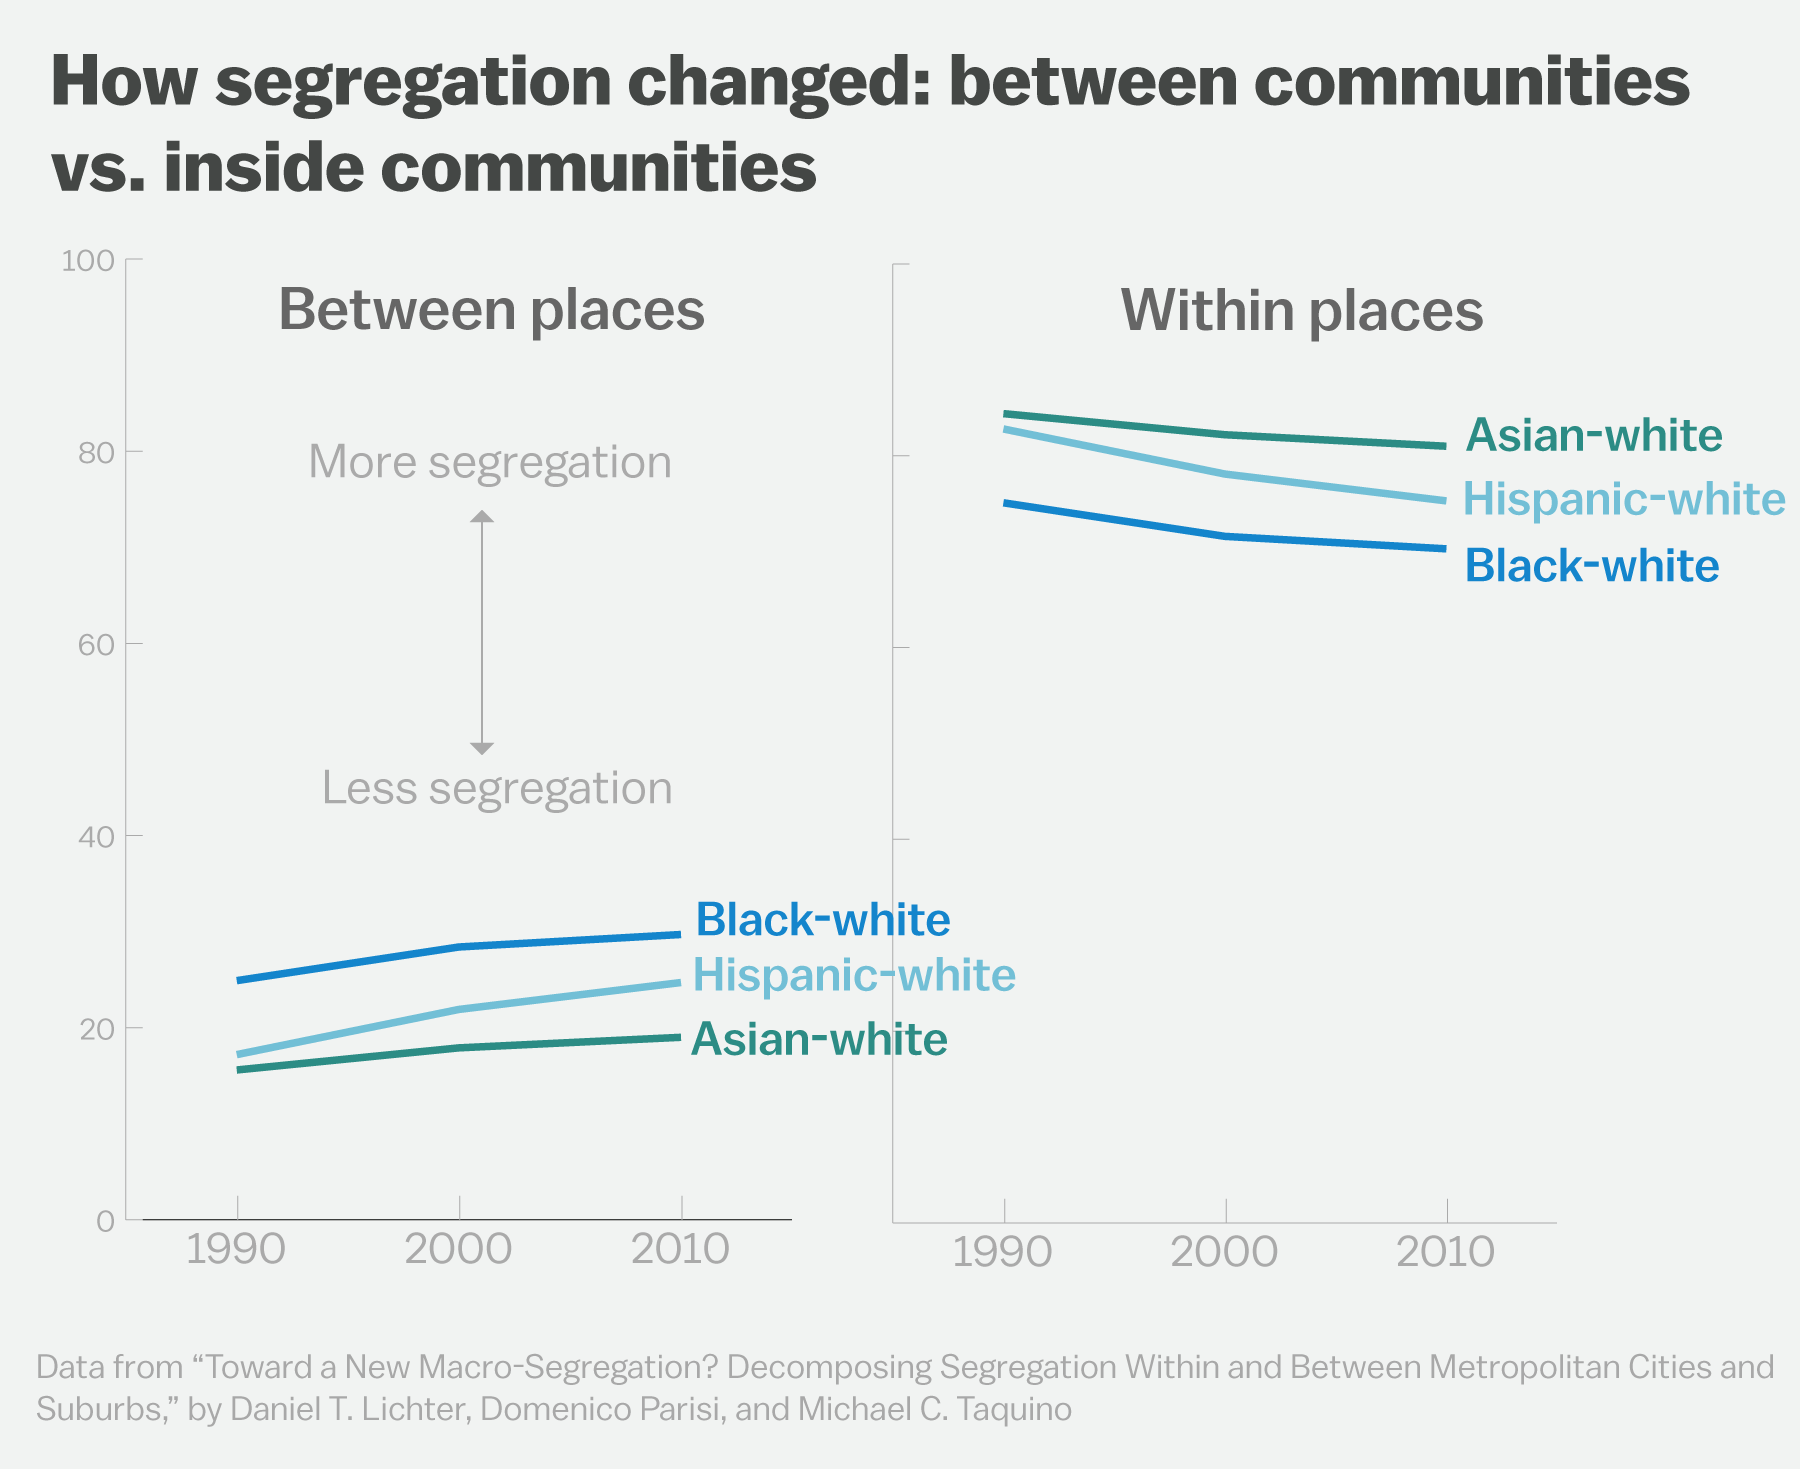 White America is quietly self-segregating - Vox